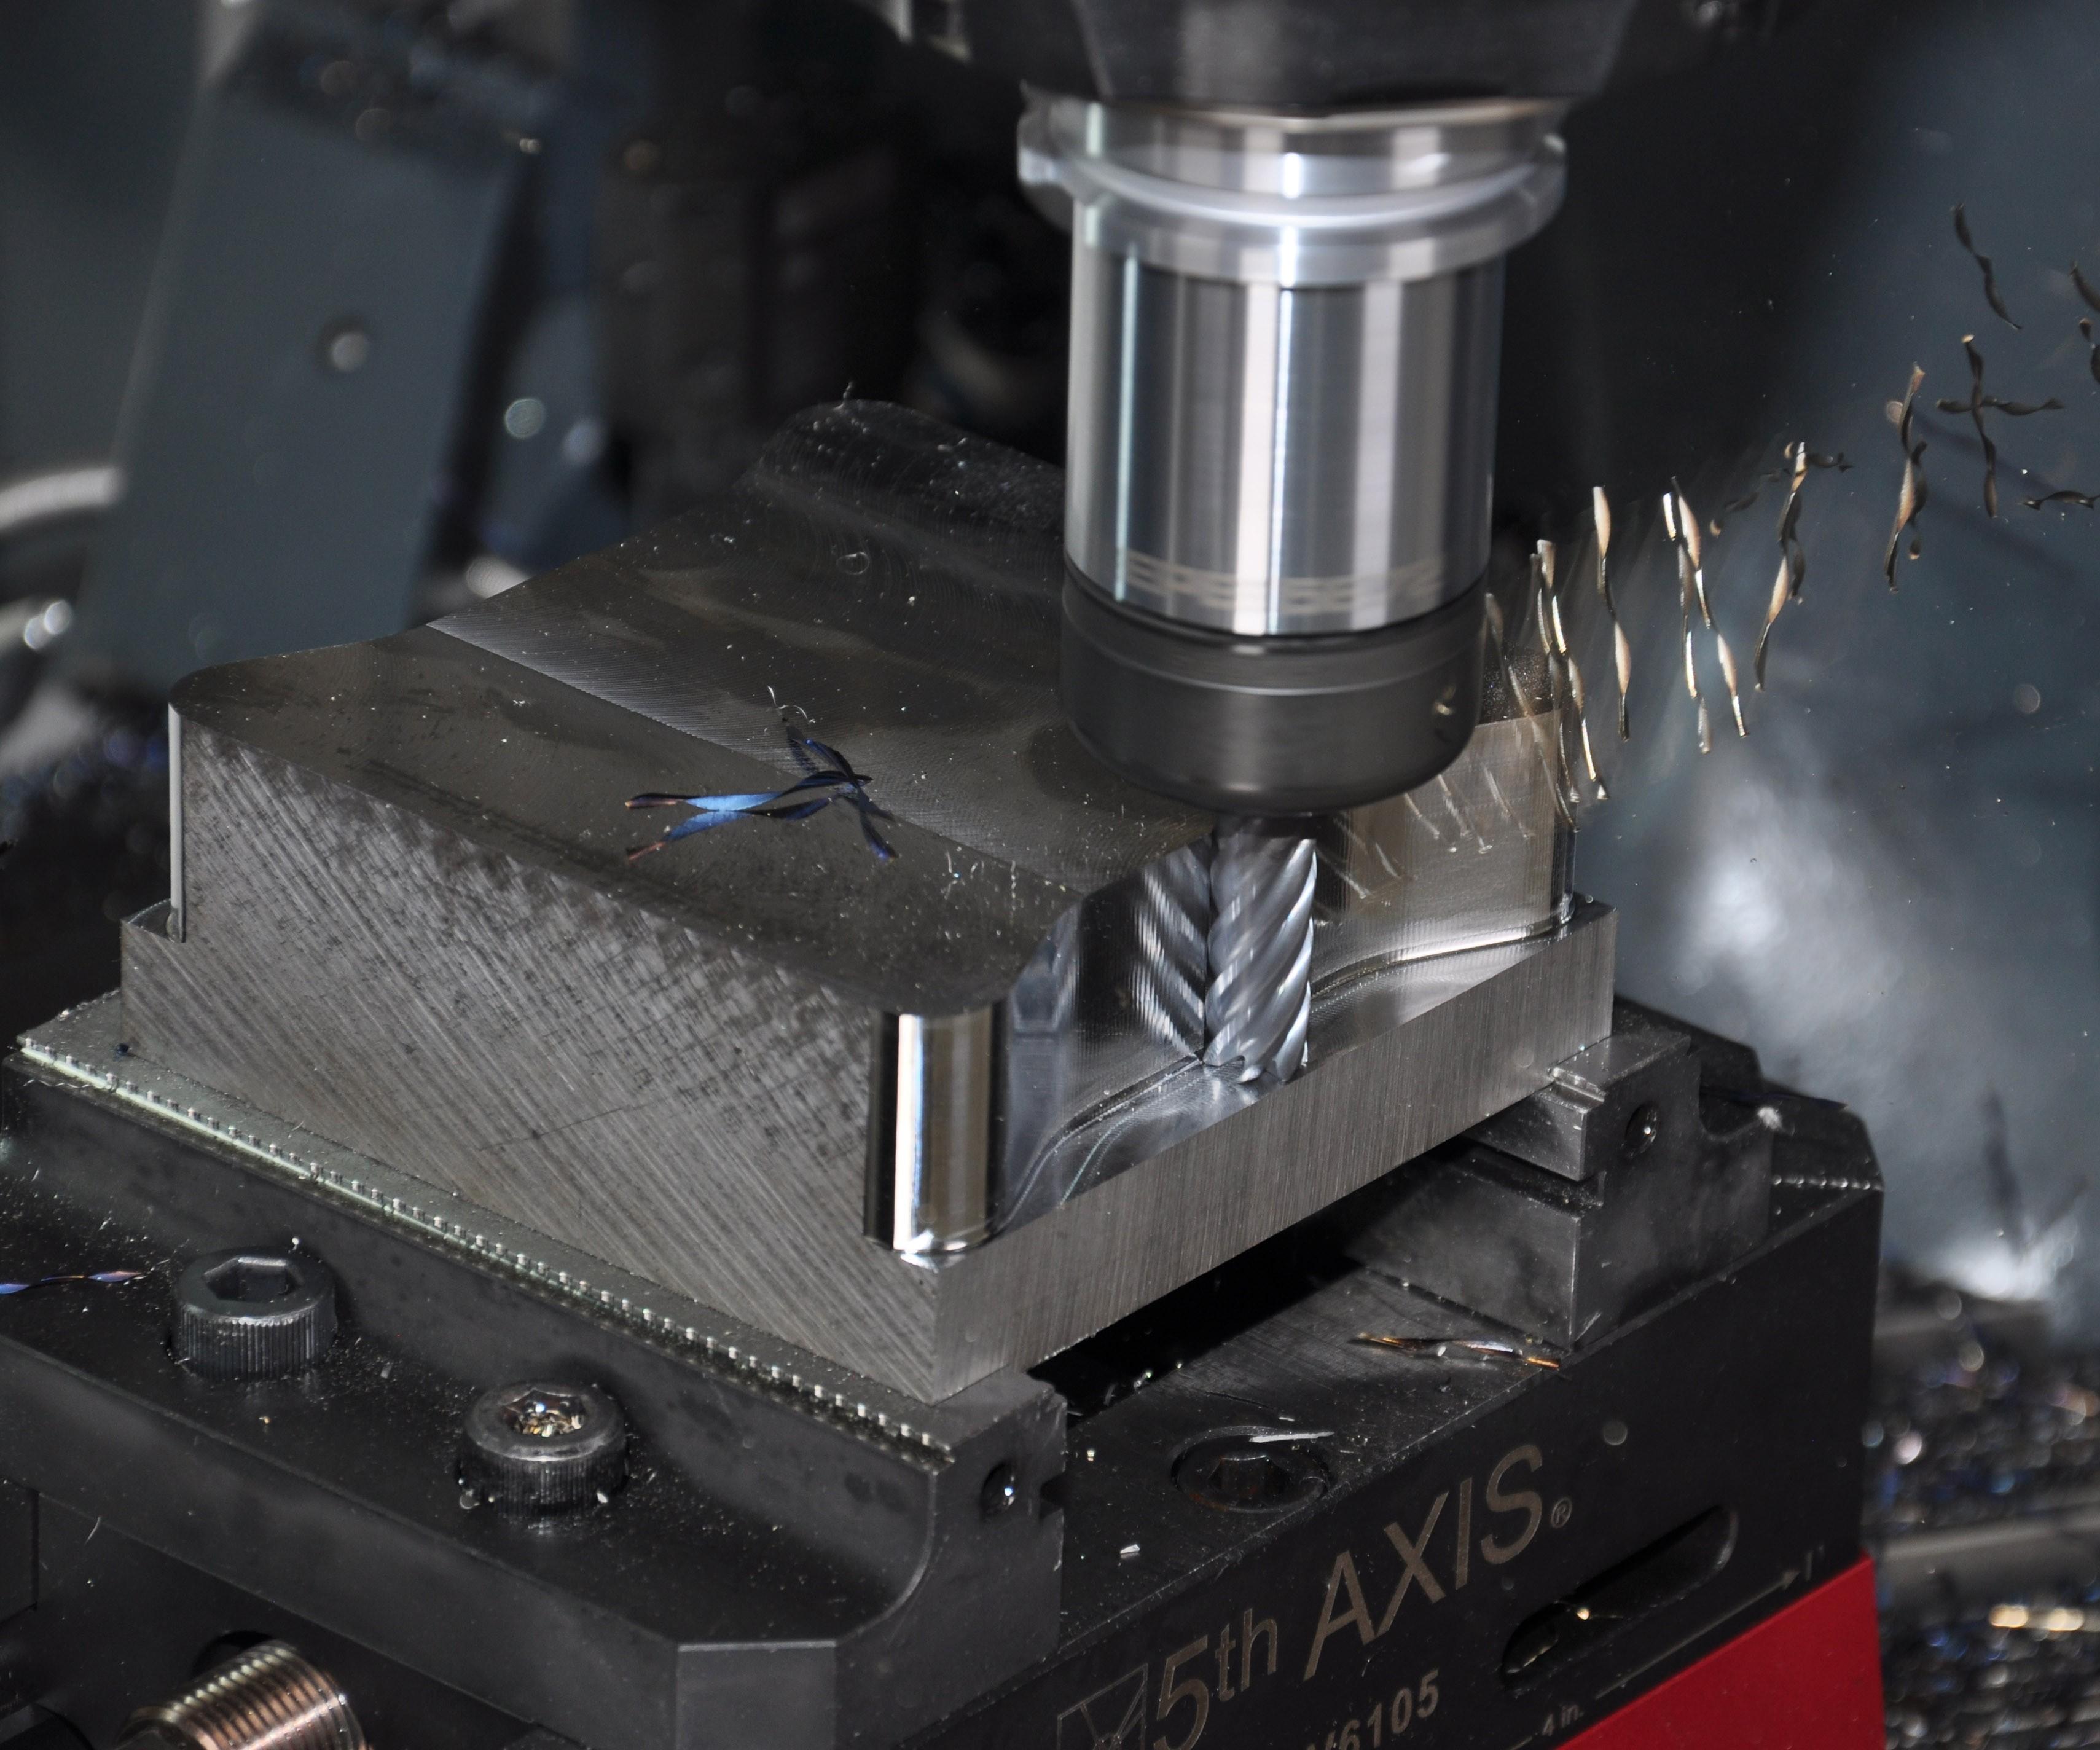 Cutting tool machining metal